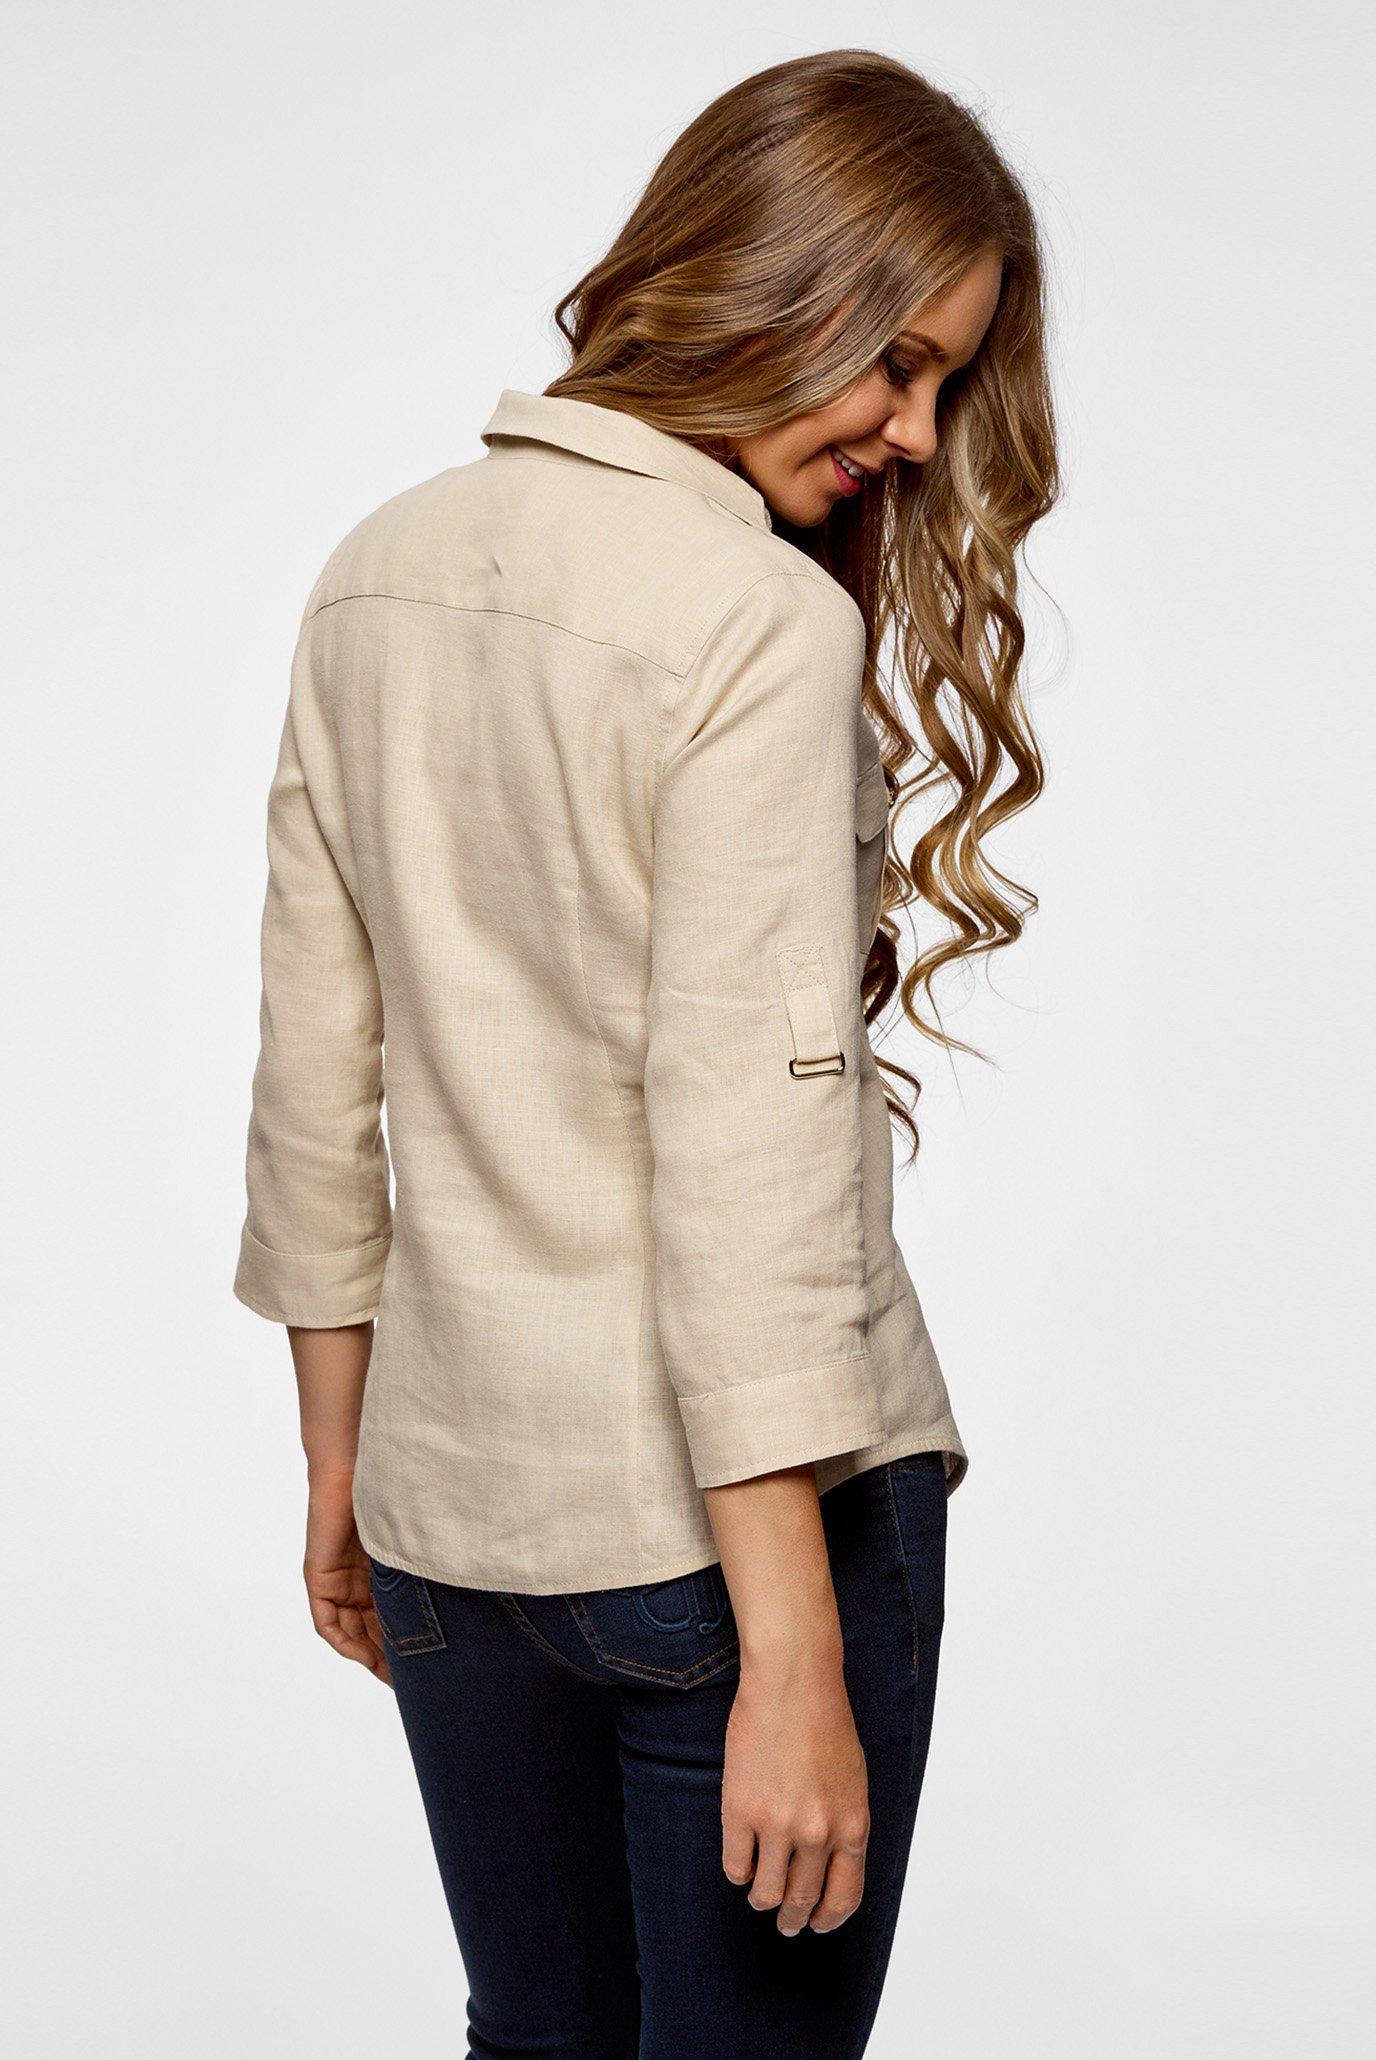 c72be8b578a Купить Женская бежевая льняная рубашка Oodji Oodji 21412145 42532 3300N –  Киев